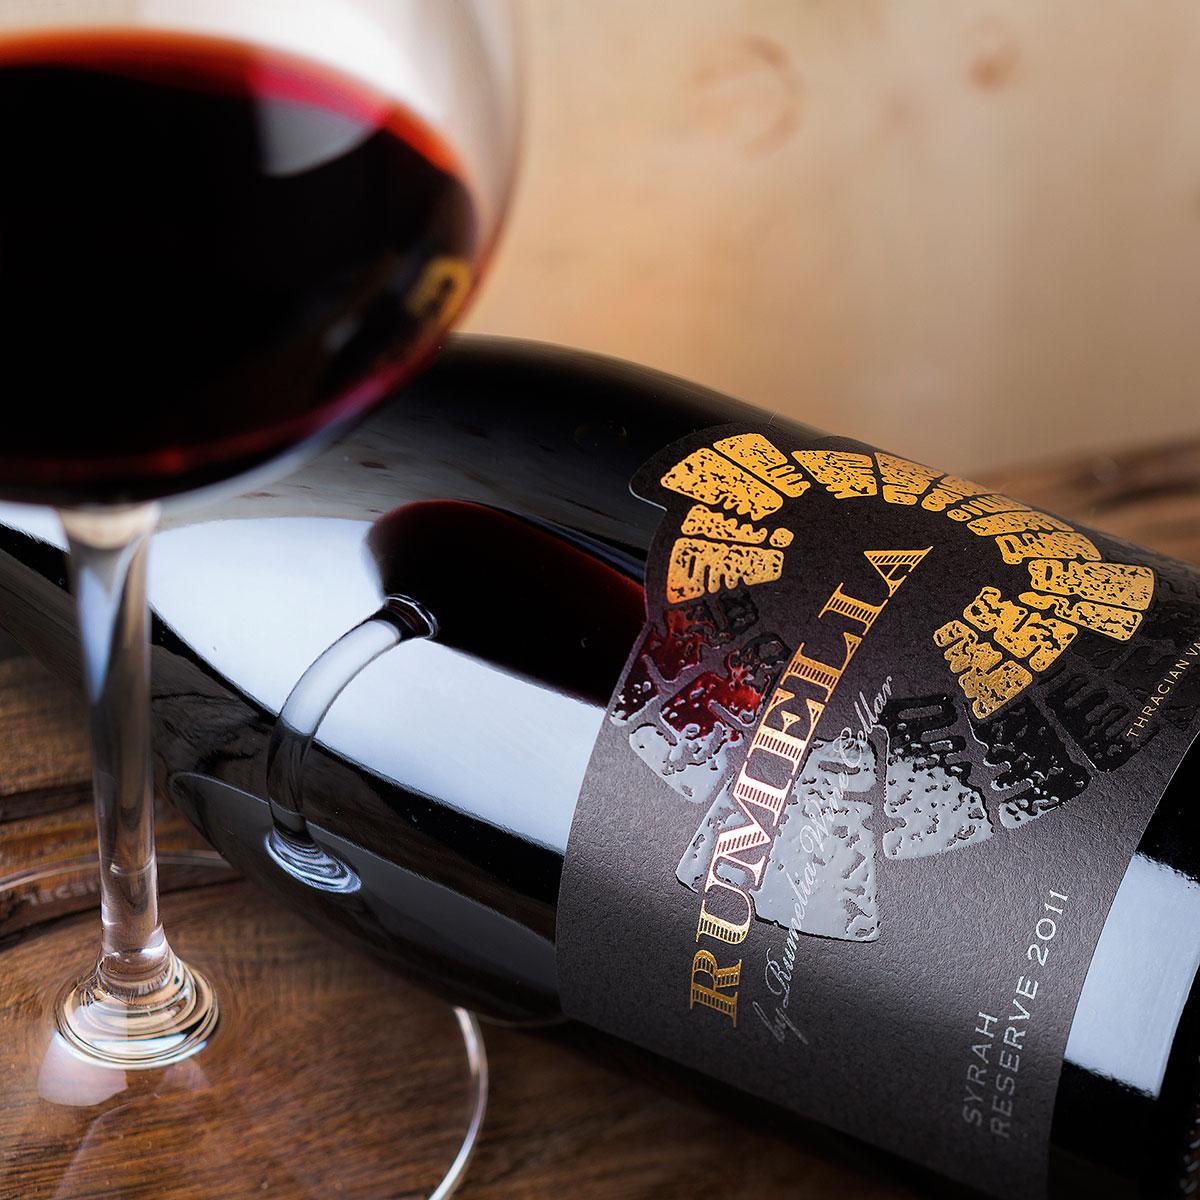 Syrah wine label